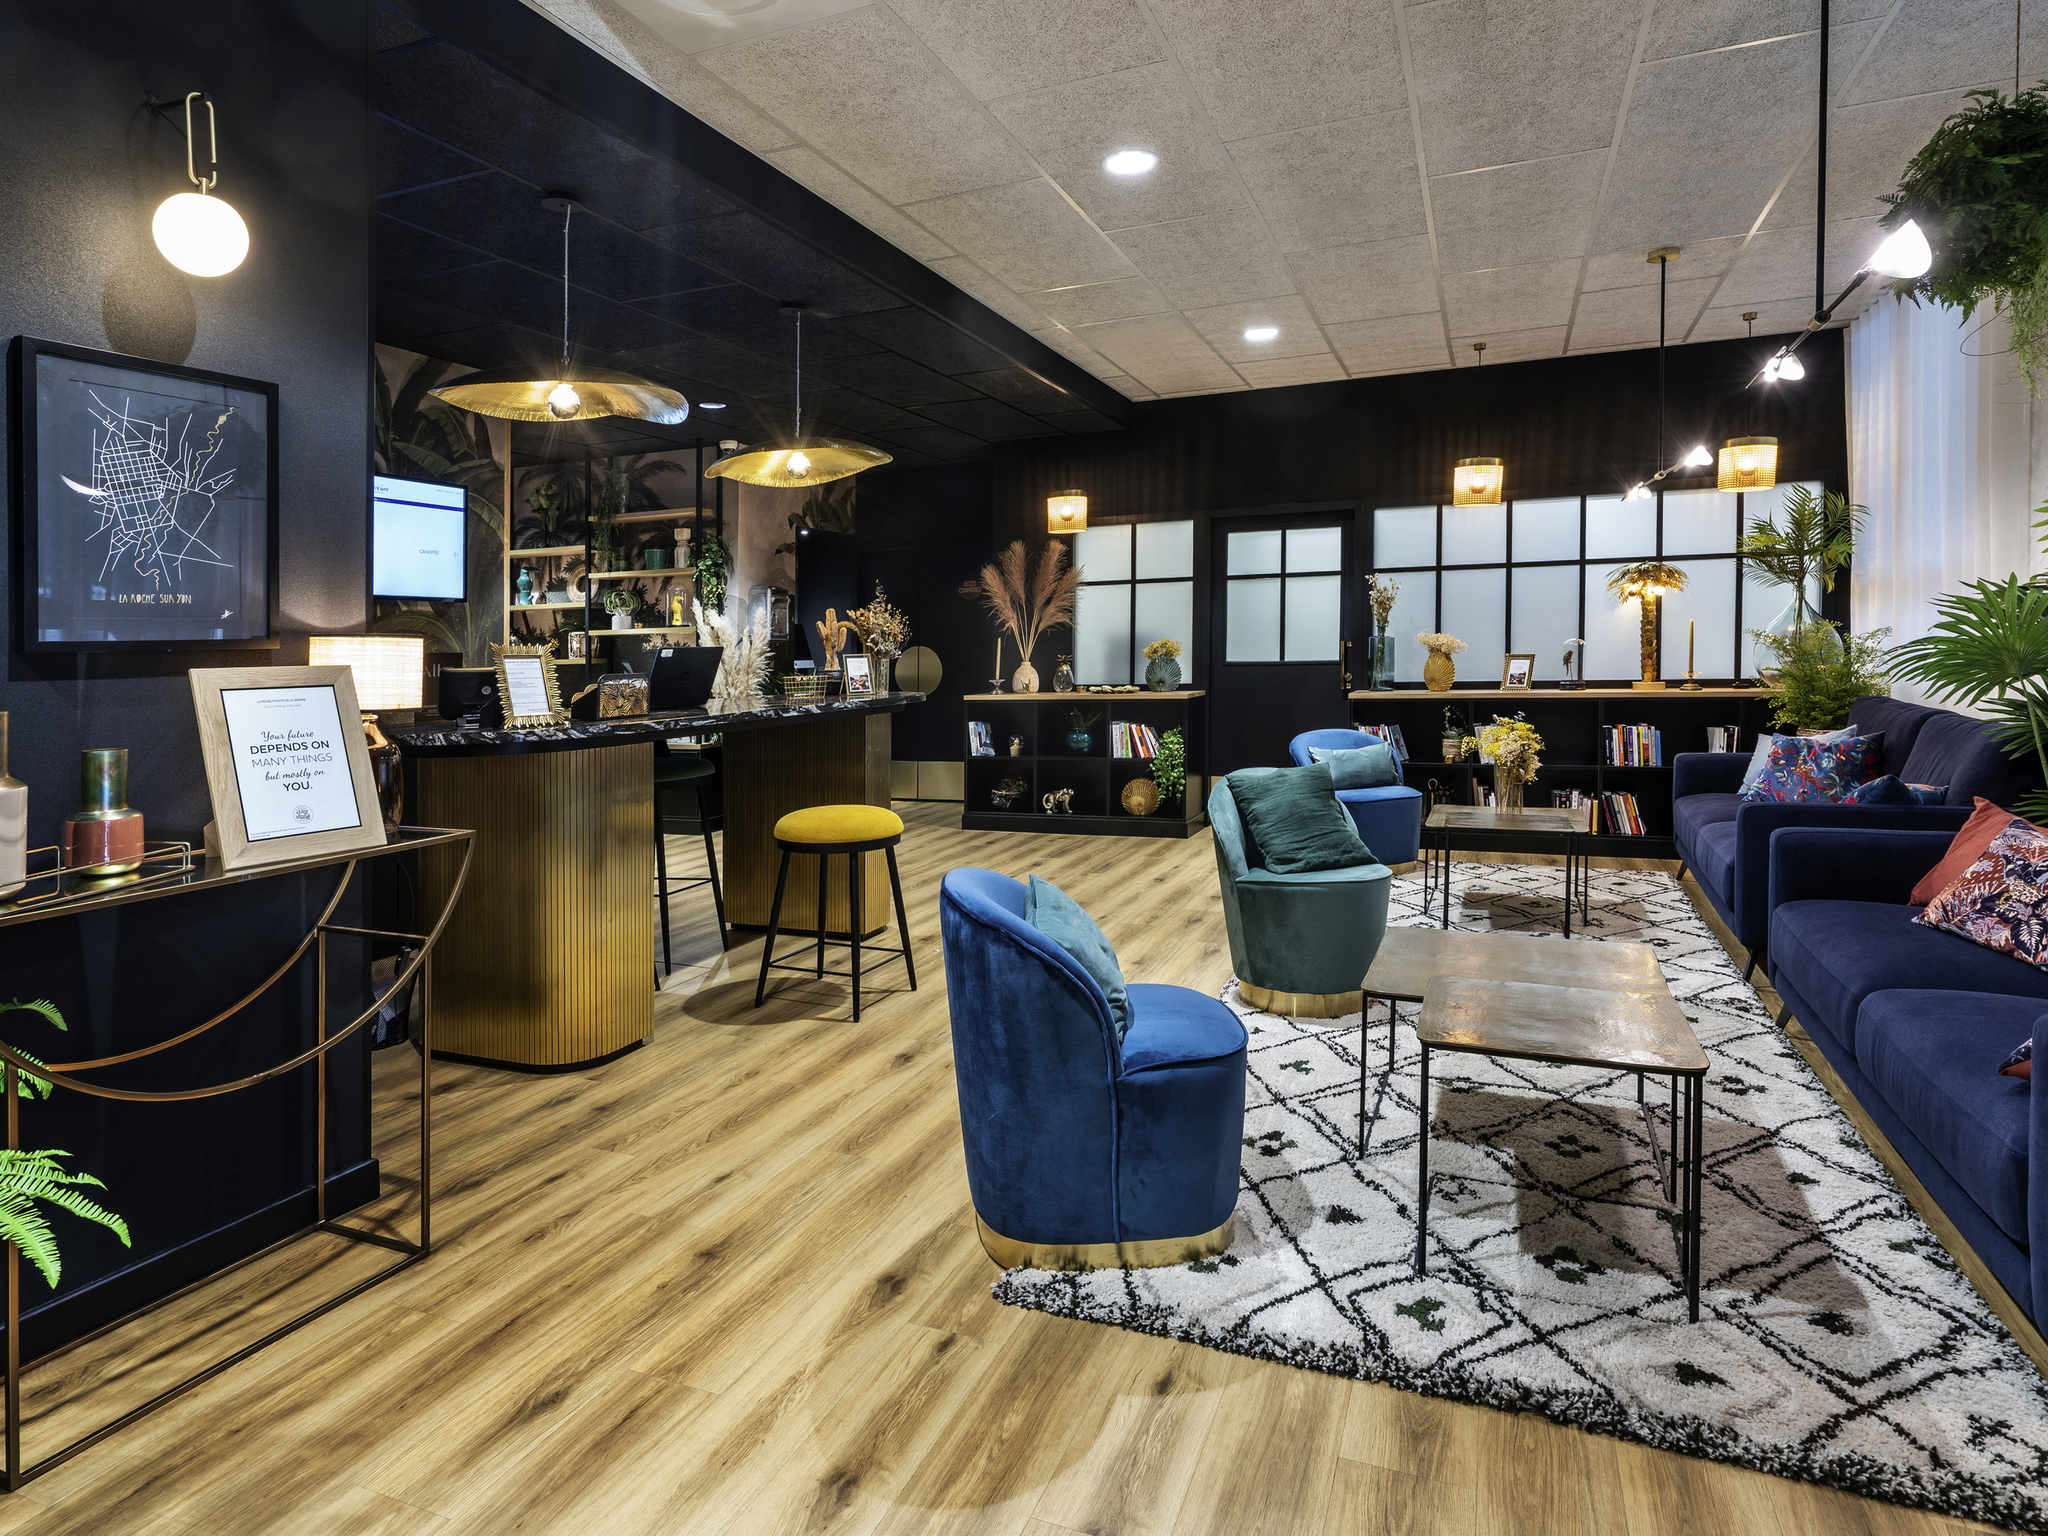 Hotel - Mercure La Roche Sur Yon Zentrum Hotel